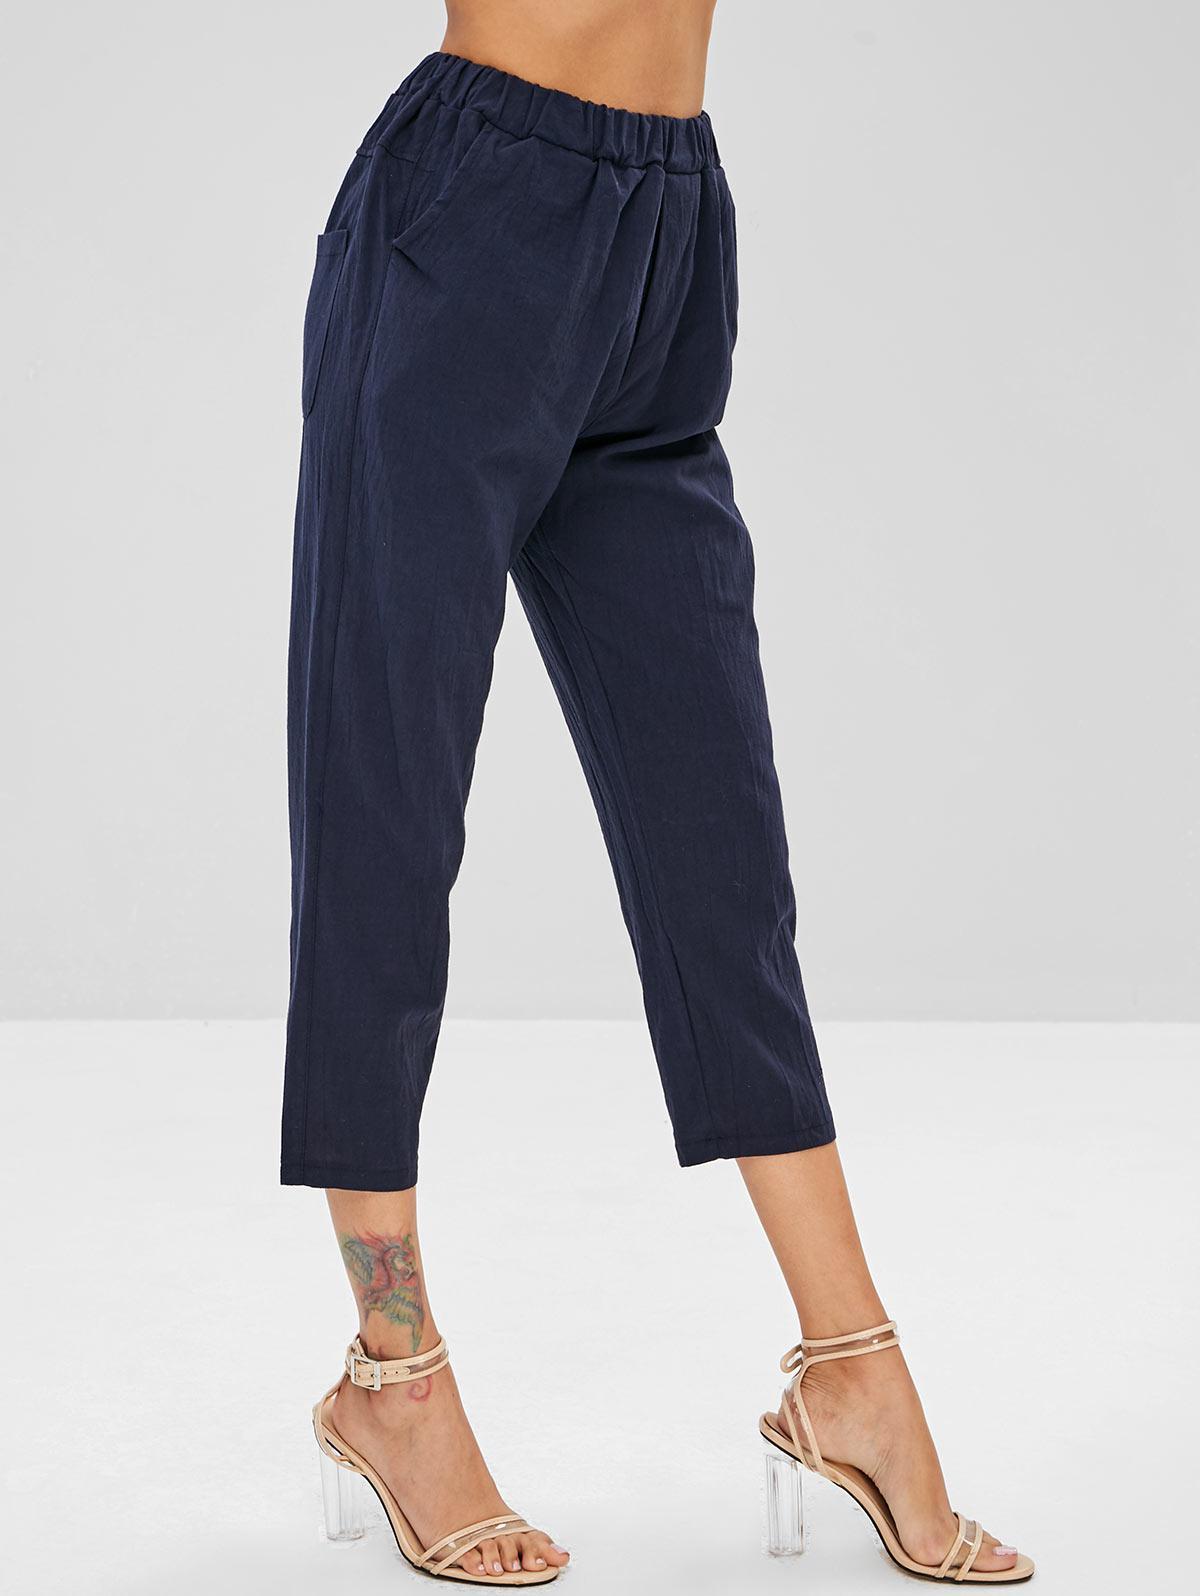 Plain Pockets Straight Pants